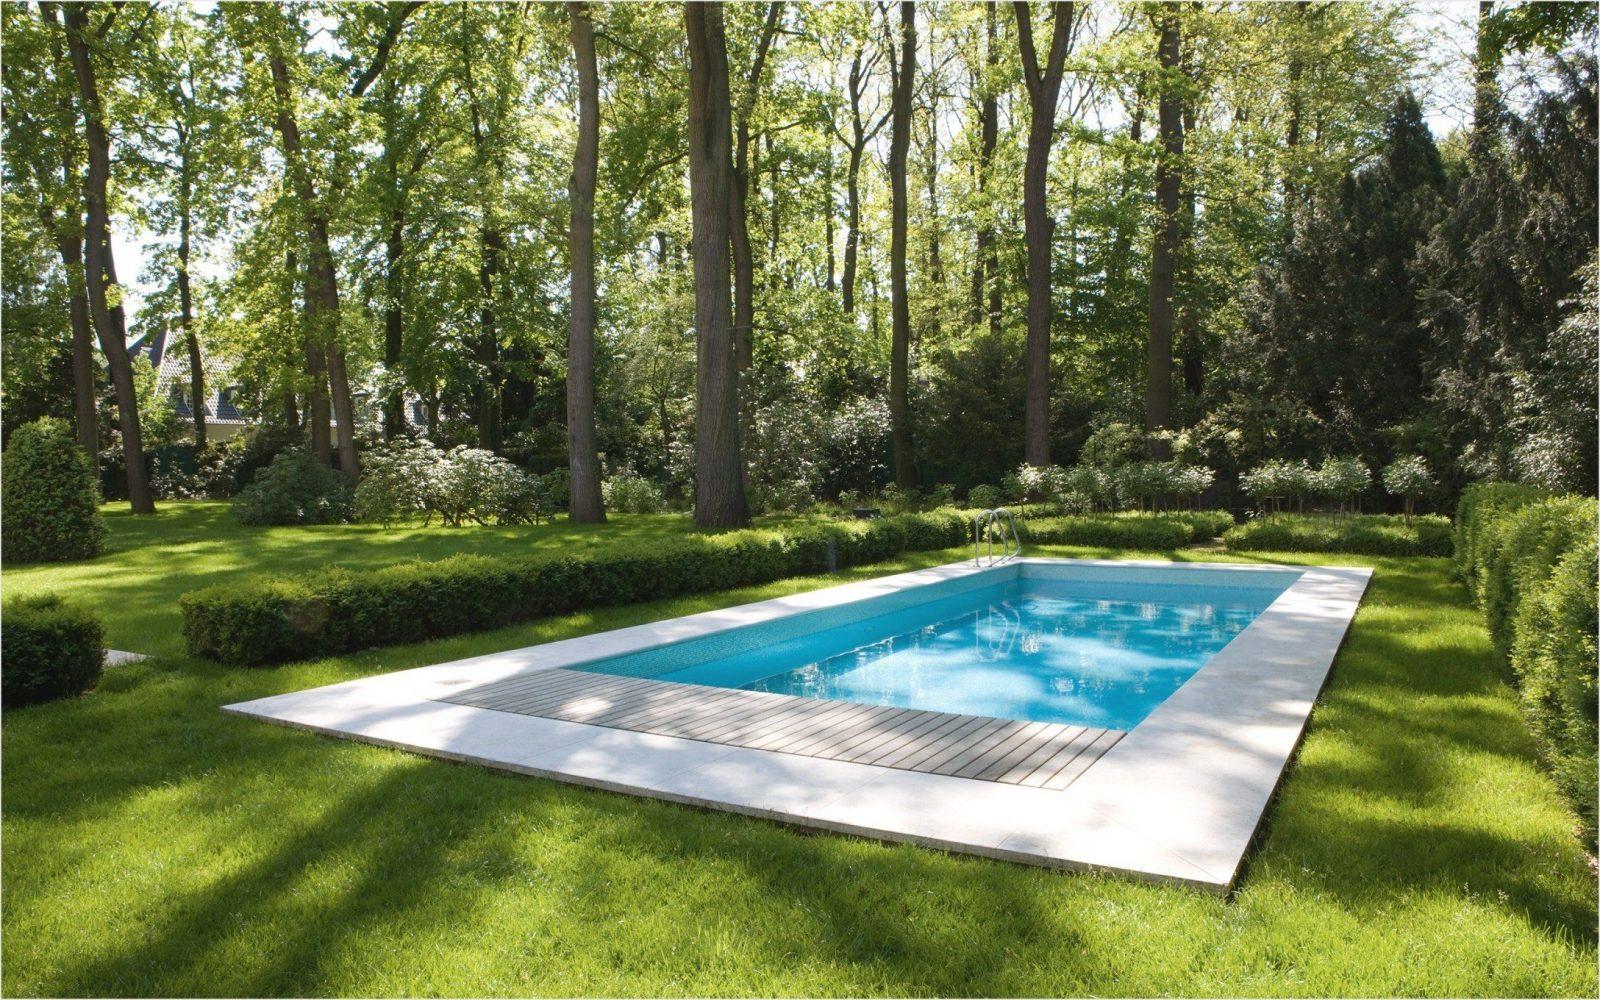 Pool Im Garten Modern Modell Um Pool Im Garten Spannende Pool Im von Runder Pool Im Garten Photo